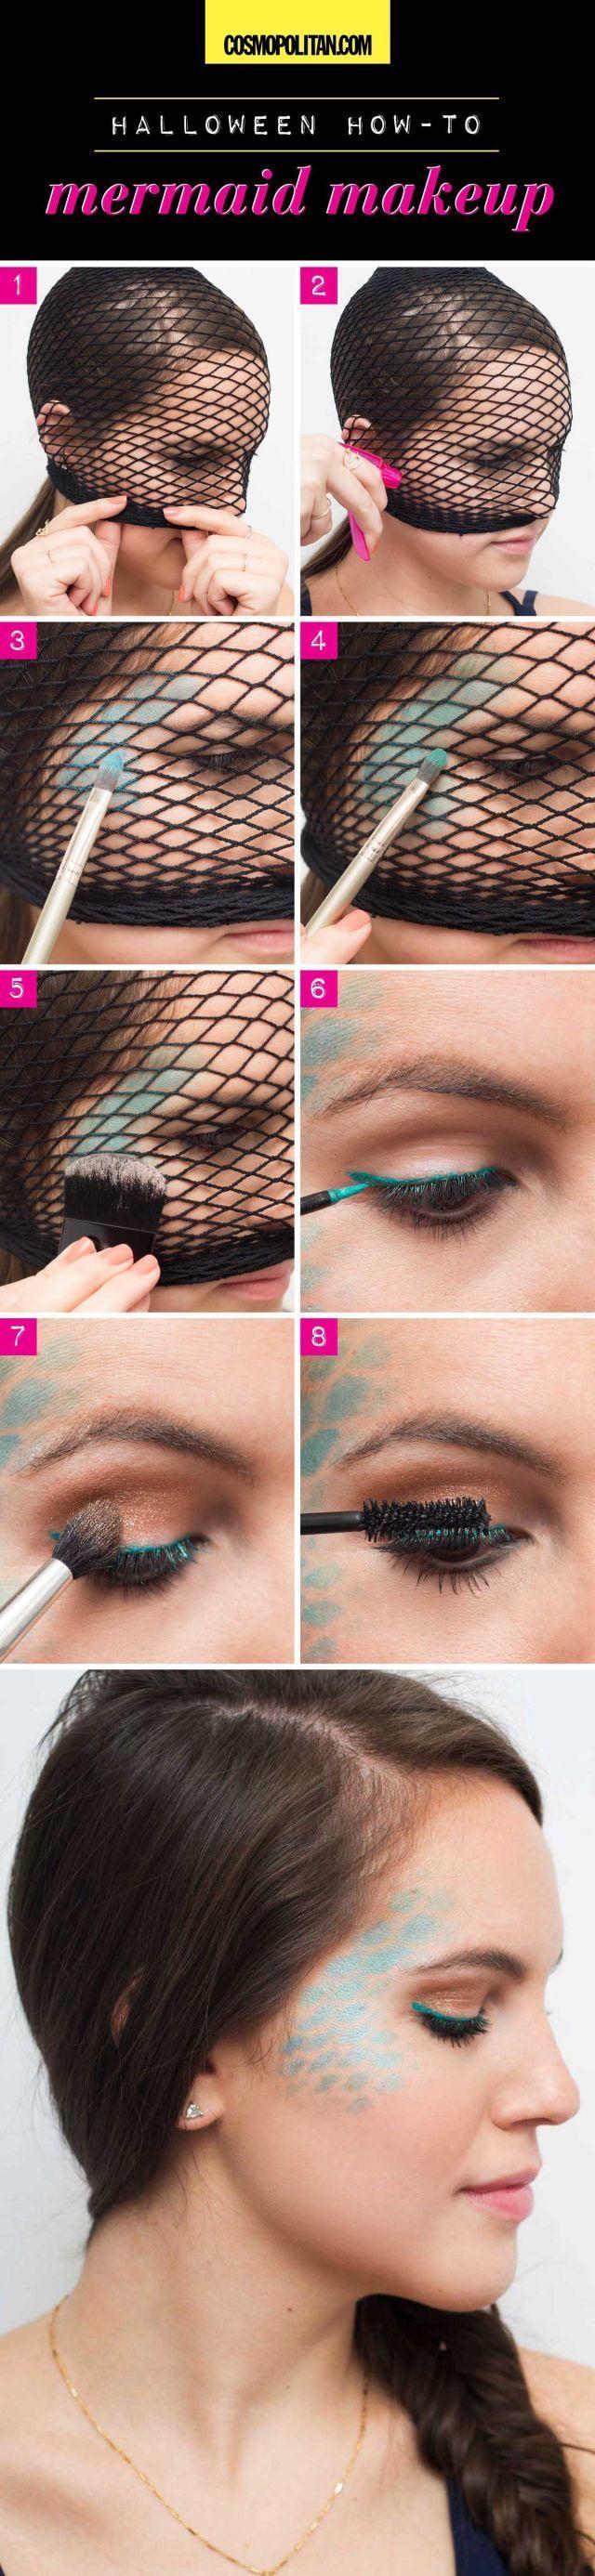 Halloween How-to: Mermaid Makeup                              …